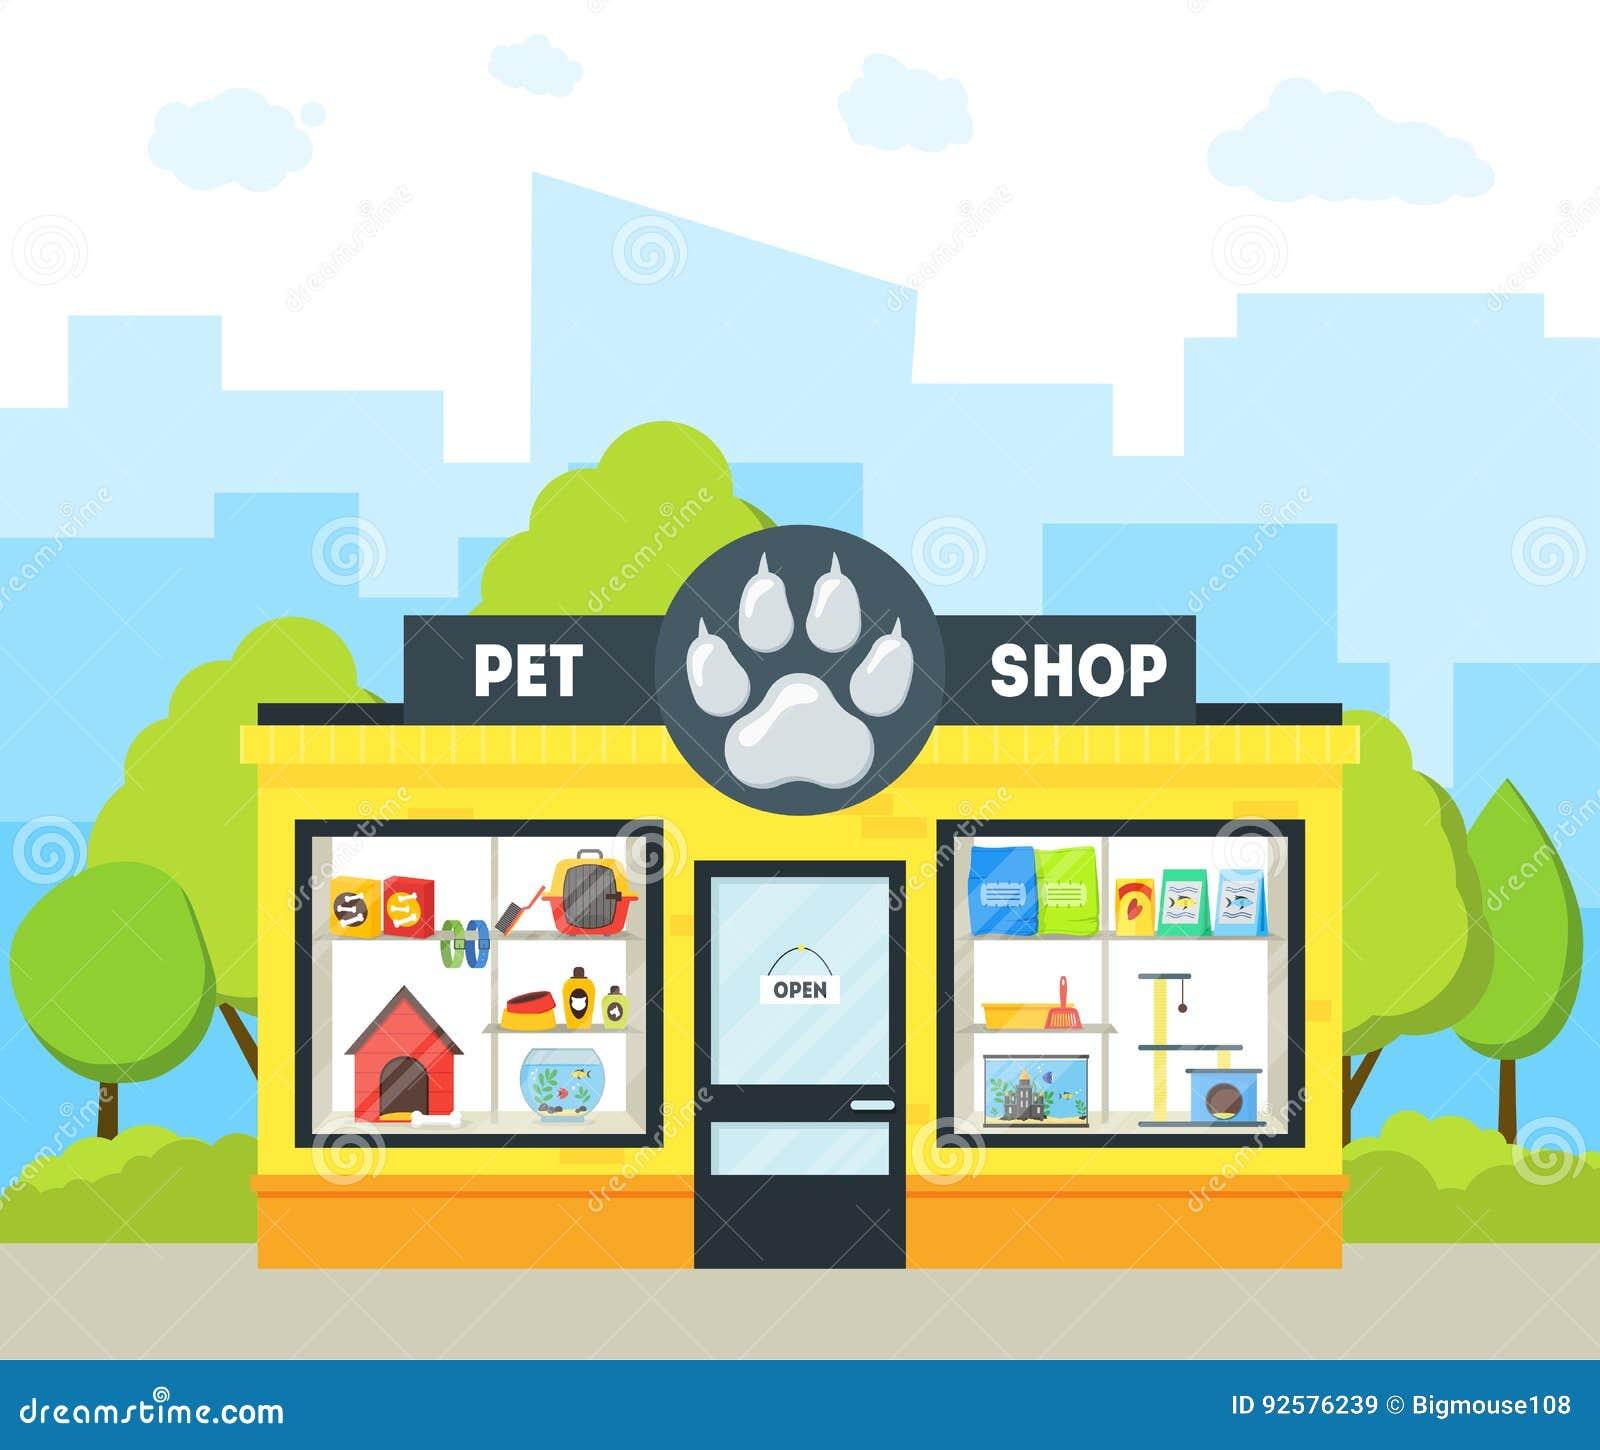 Cartoon Pet Shop Building Vector Stock Image